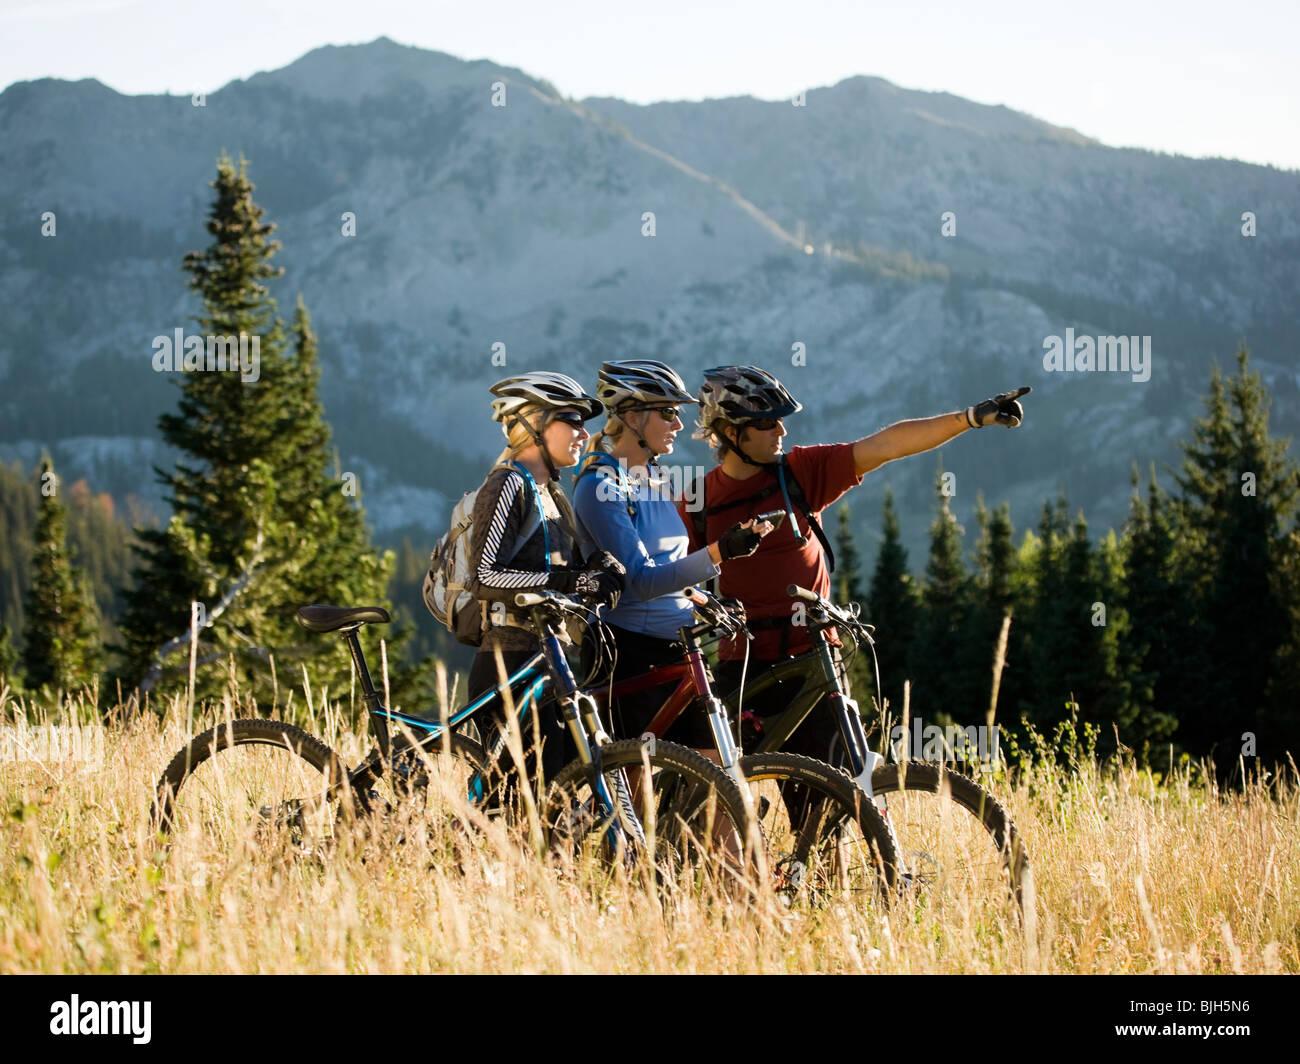 mountain bikers - Stock Image